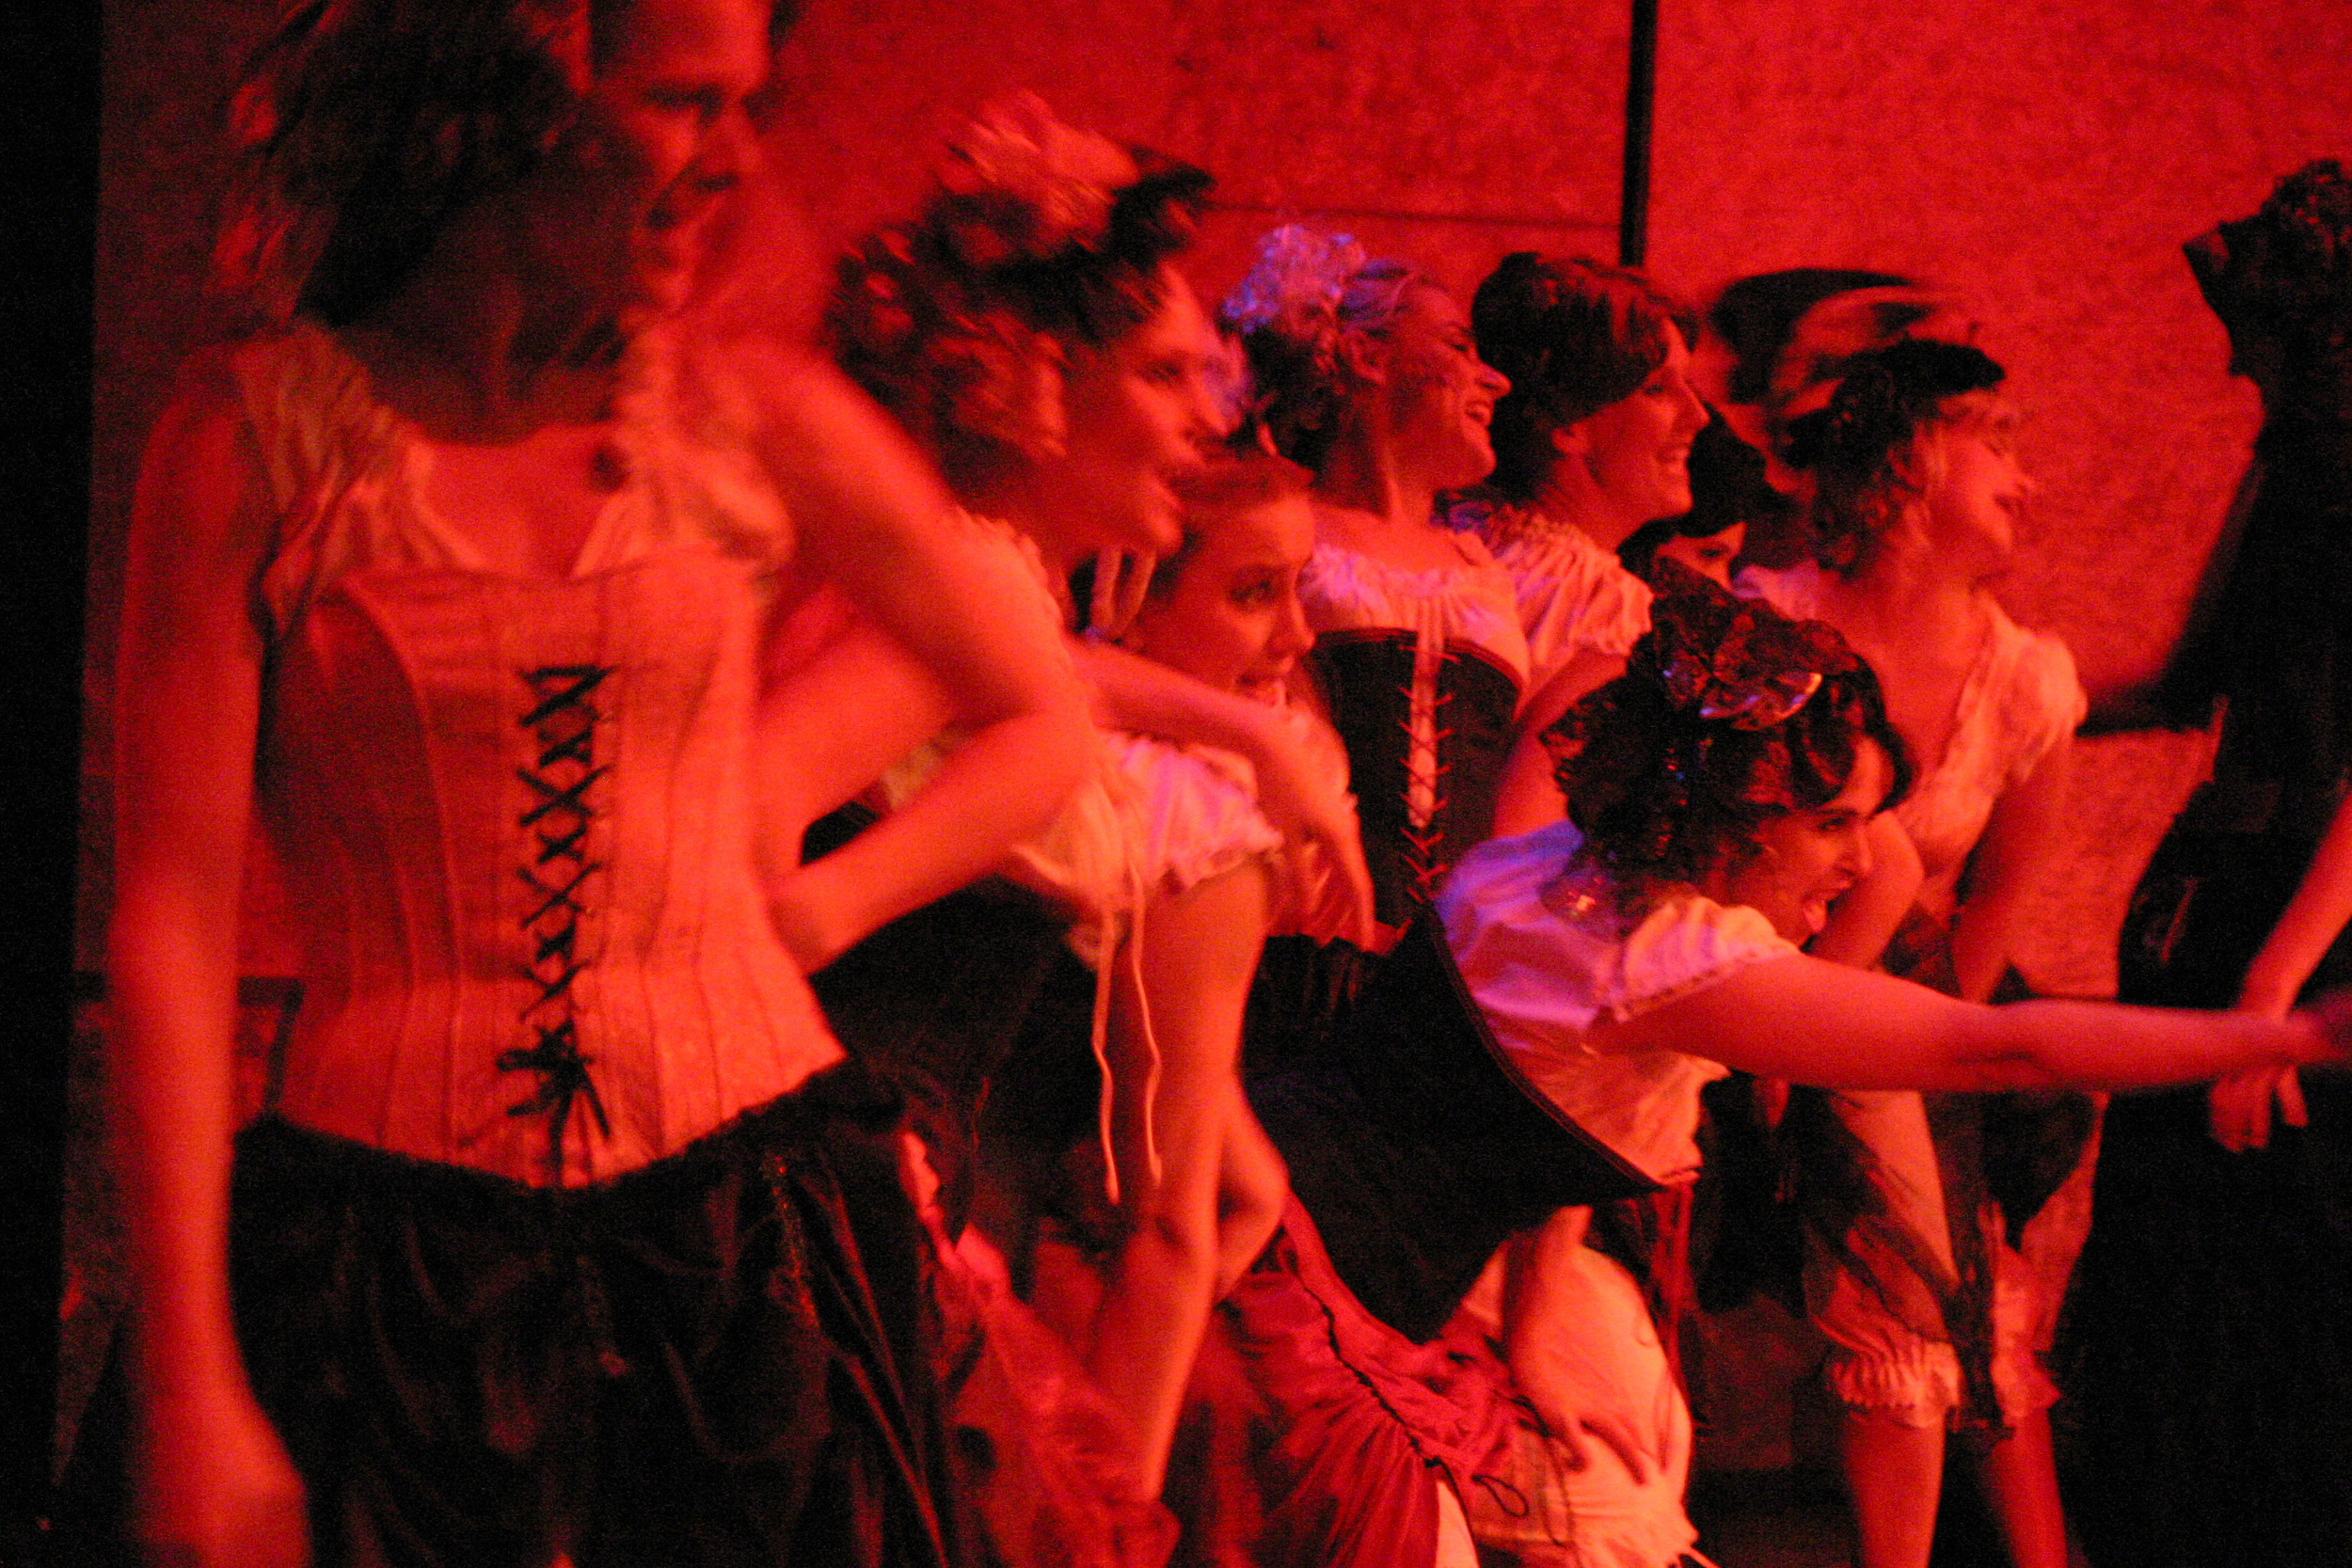 247 - The Scarlet Pimpernel 2005 - Veldhoven.jpg